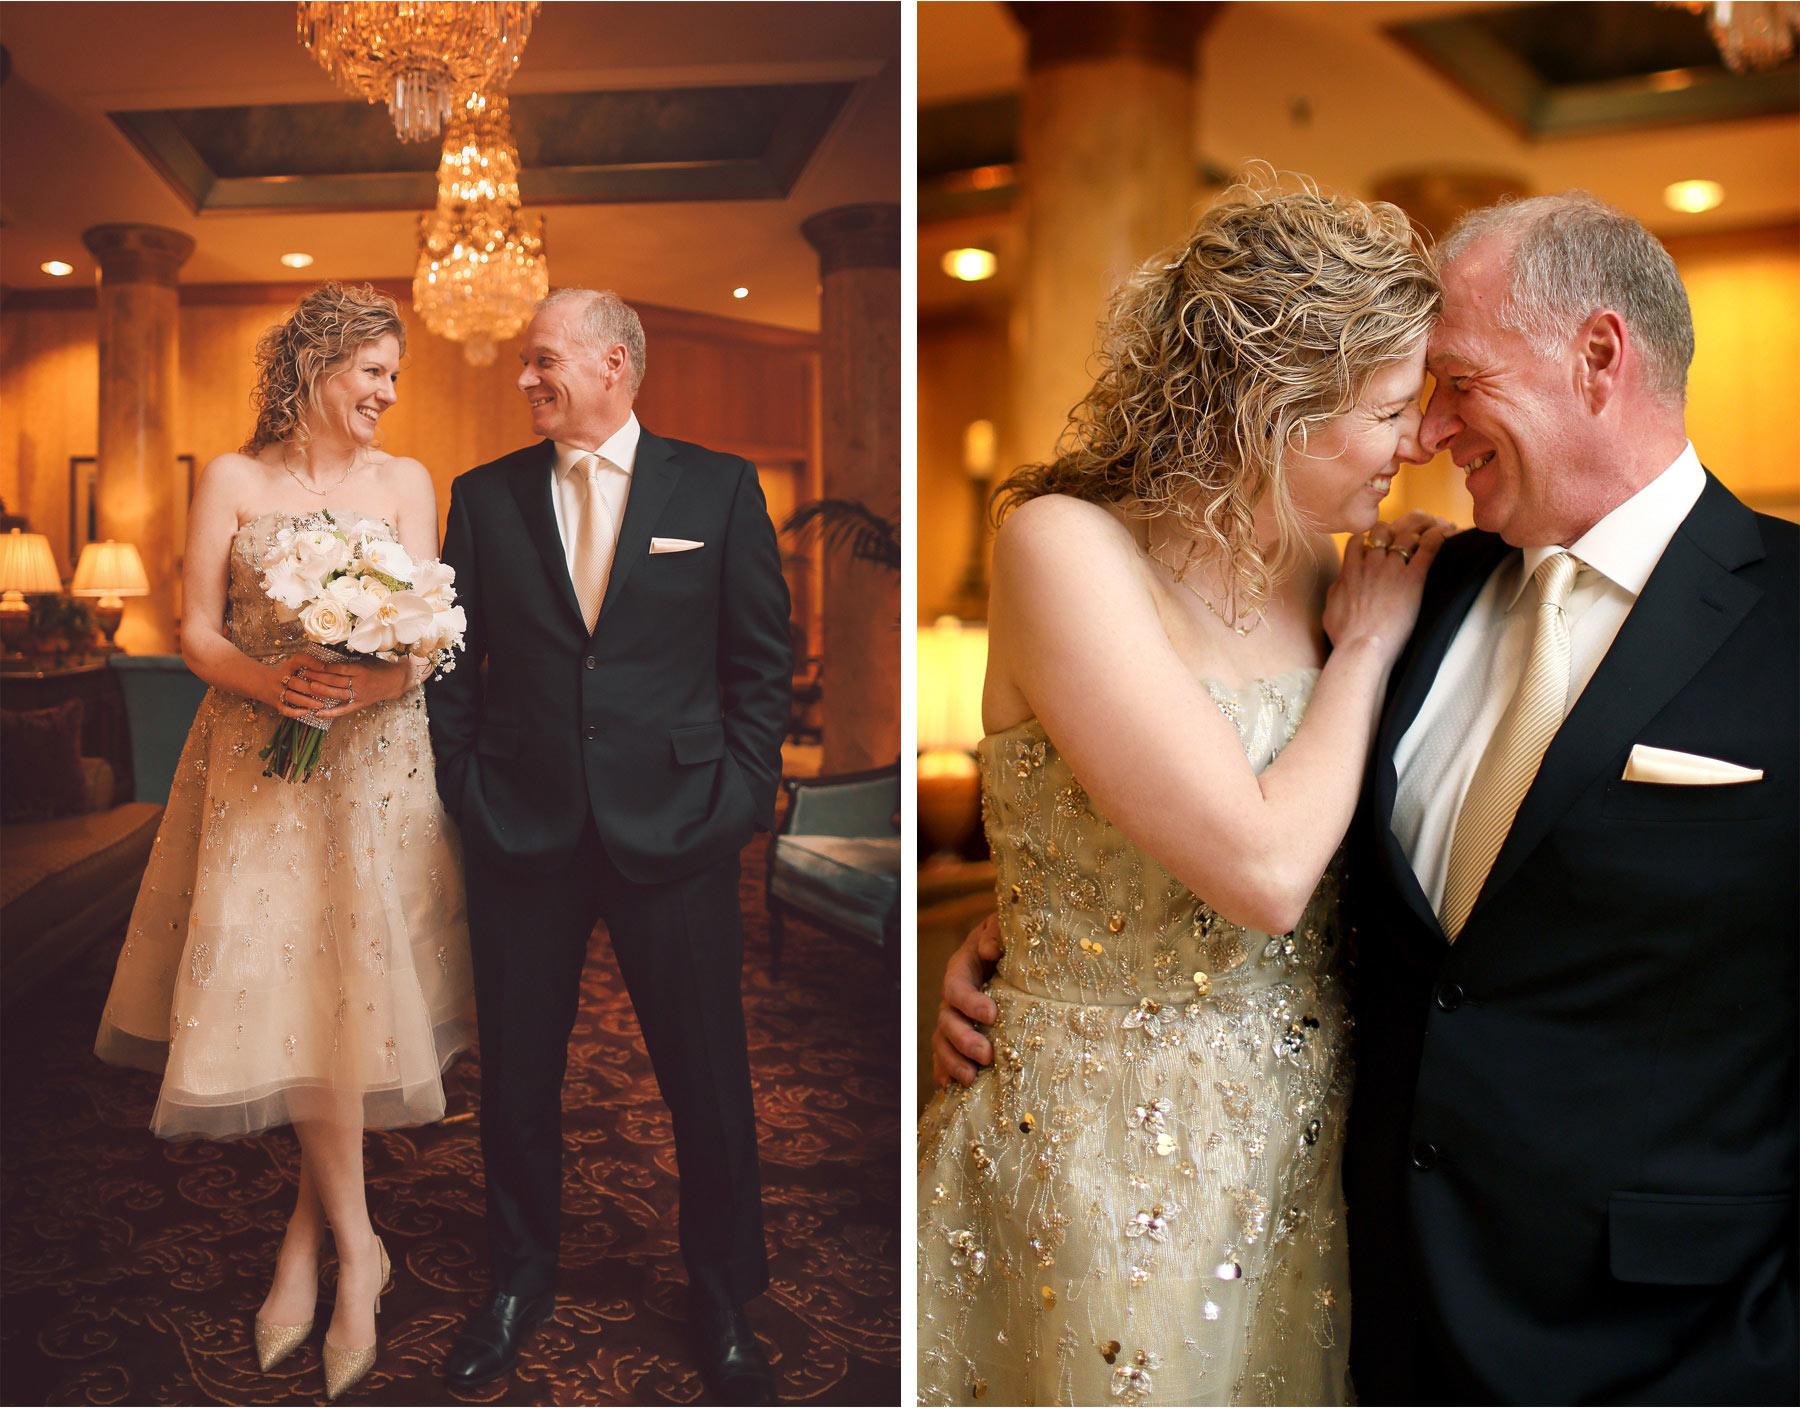 06-Saint-Paul-Minnesota-Wedding-Photographer-by-Andrew-Vick-Photography-Winter-Landmark-Center-First-Meeting-Look-Bride-Groom-Flowers-Embrace-Laughter-Vintage-Dannette-and-Darren.jpg